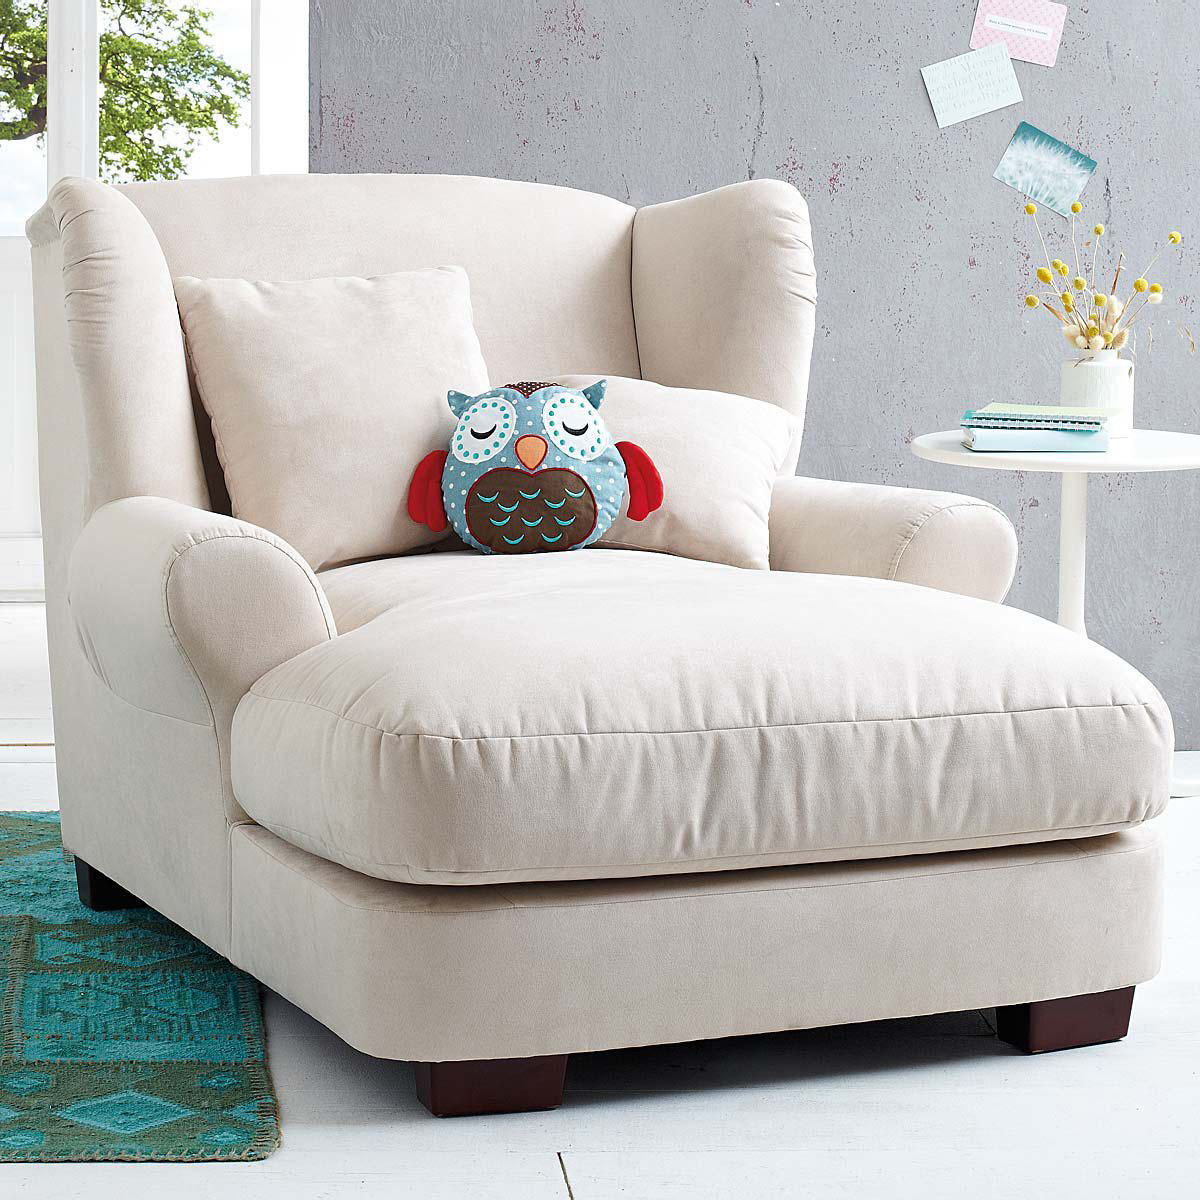 vintage sessel riesensessel retro look versandkostenfrei. Black Bedroom Furniture Sets. Home Design Ideas